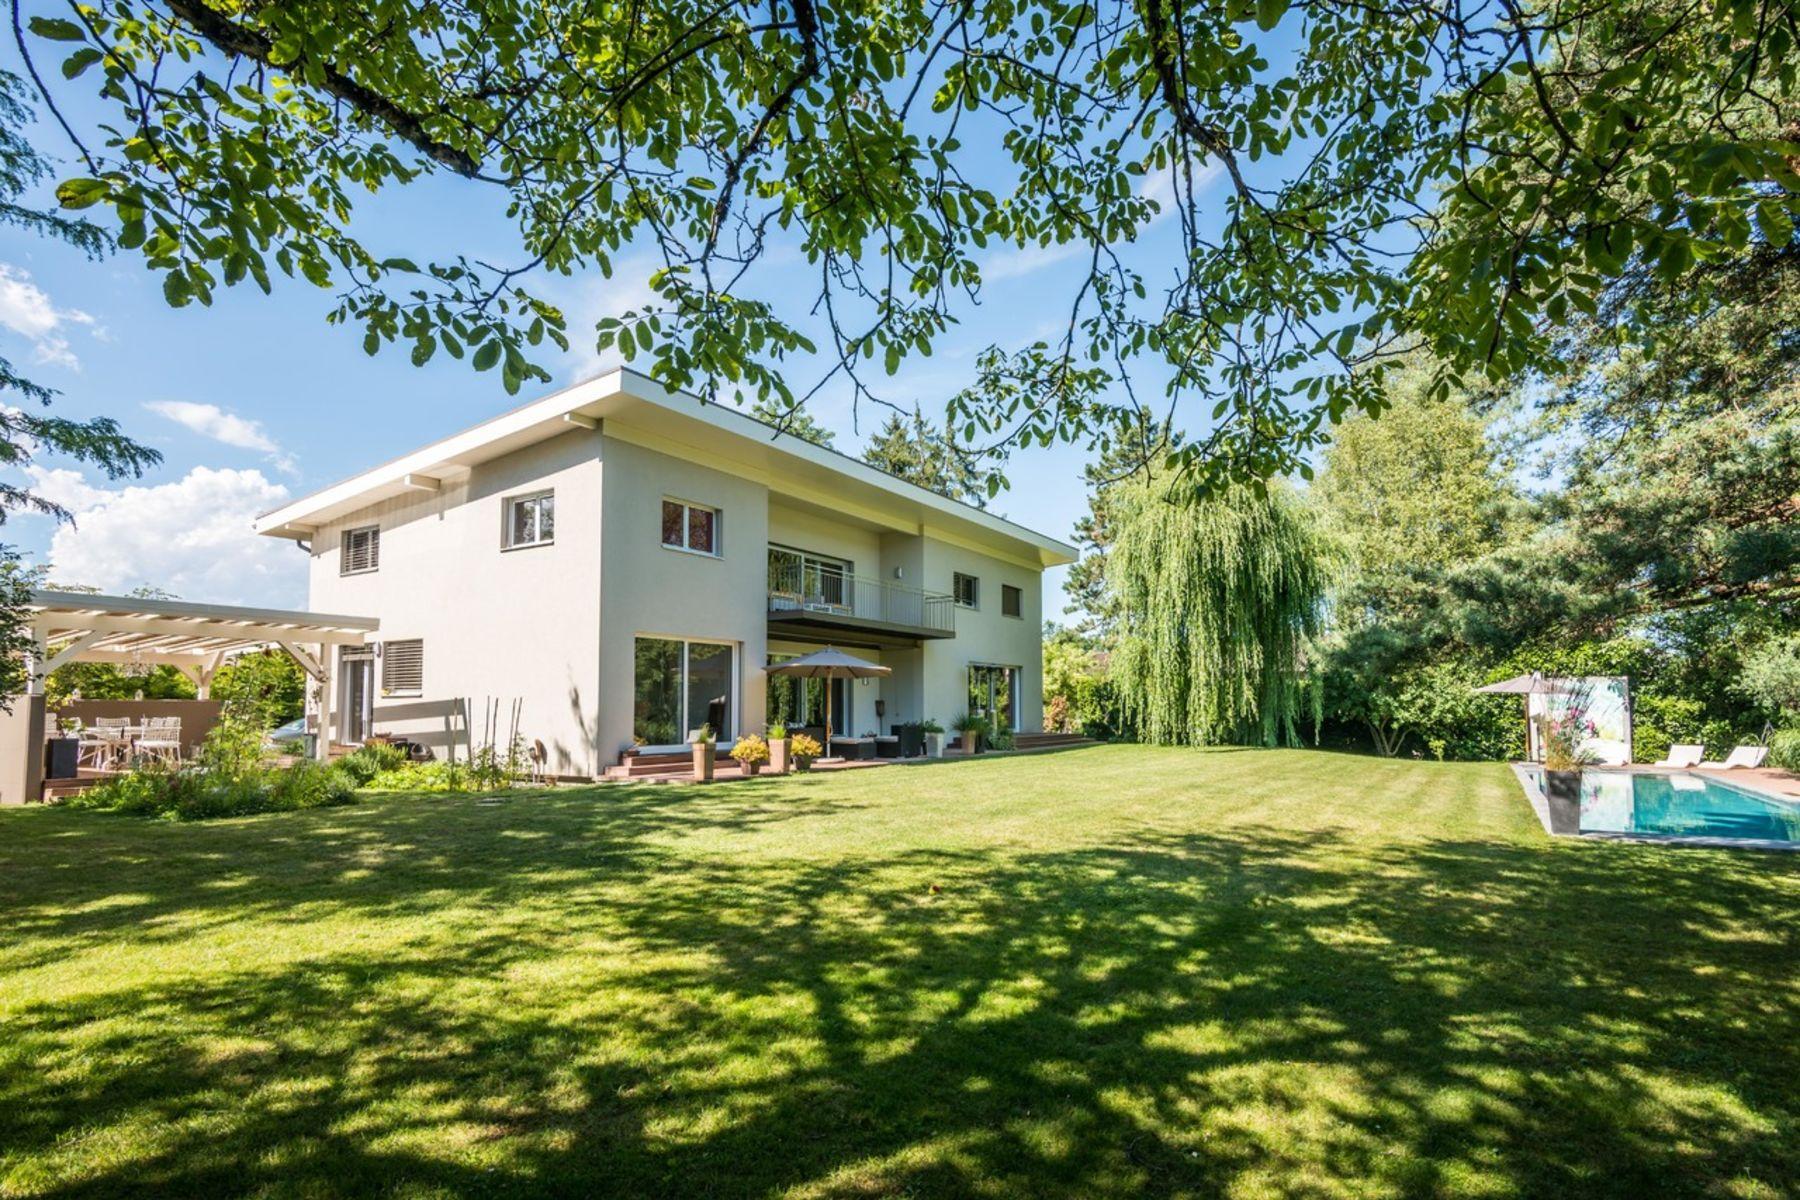 Single Family Home for Sale at Detached, spacious villa with plenty of natural light Vandoeuvres Vandoeuvres, Geneva, 1253 Switzerland